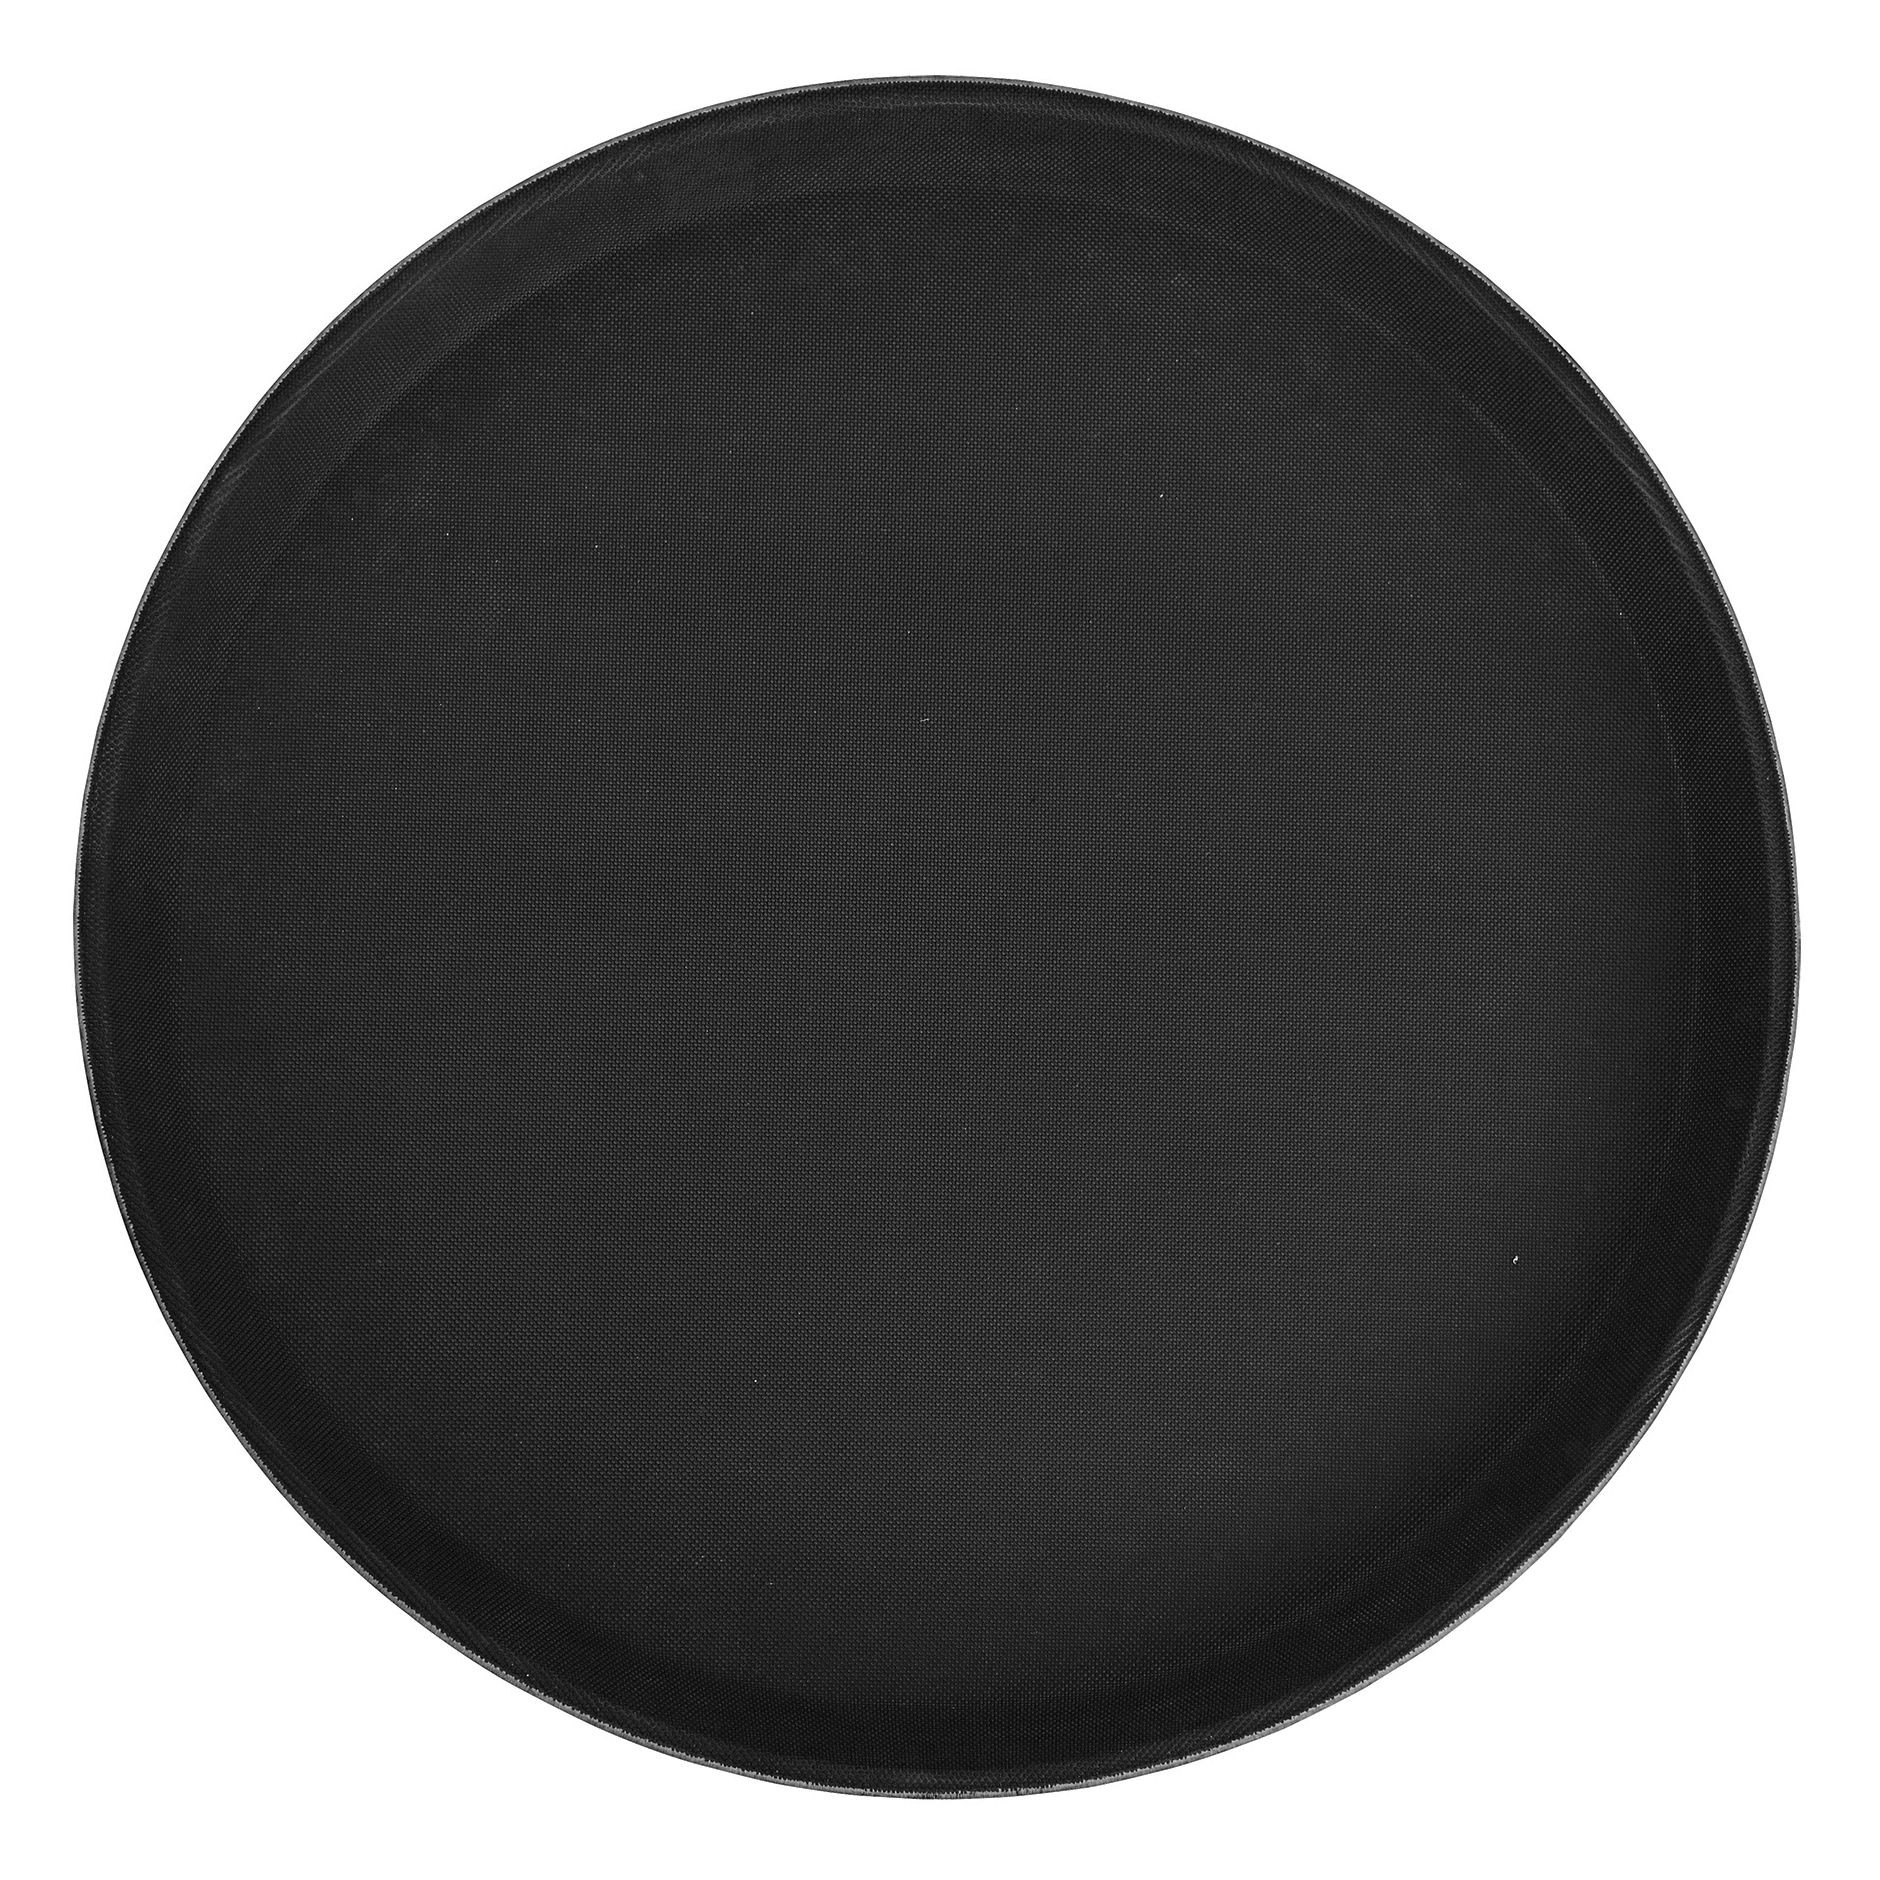 Winco TFG-14K Black Round Non-Slip Fiberglass Tray, 14''